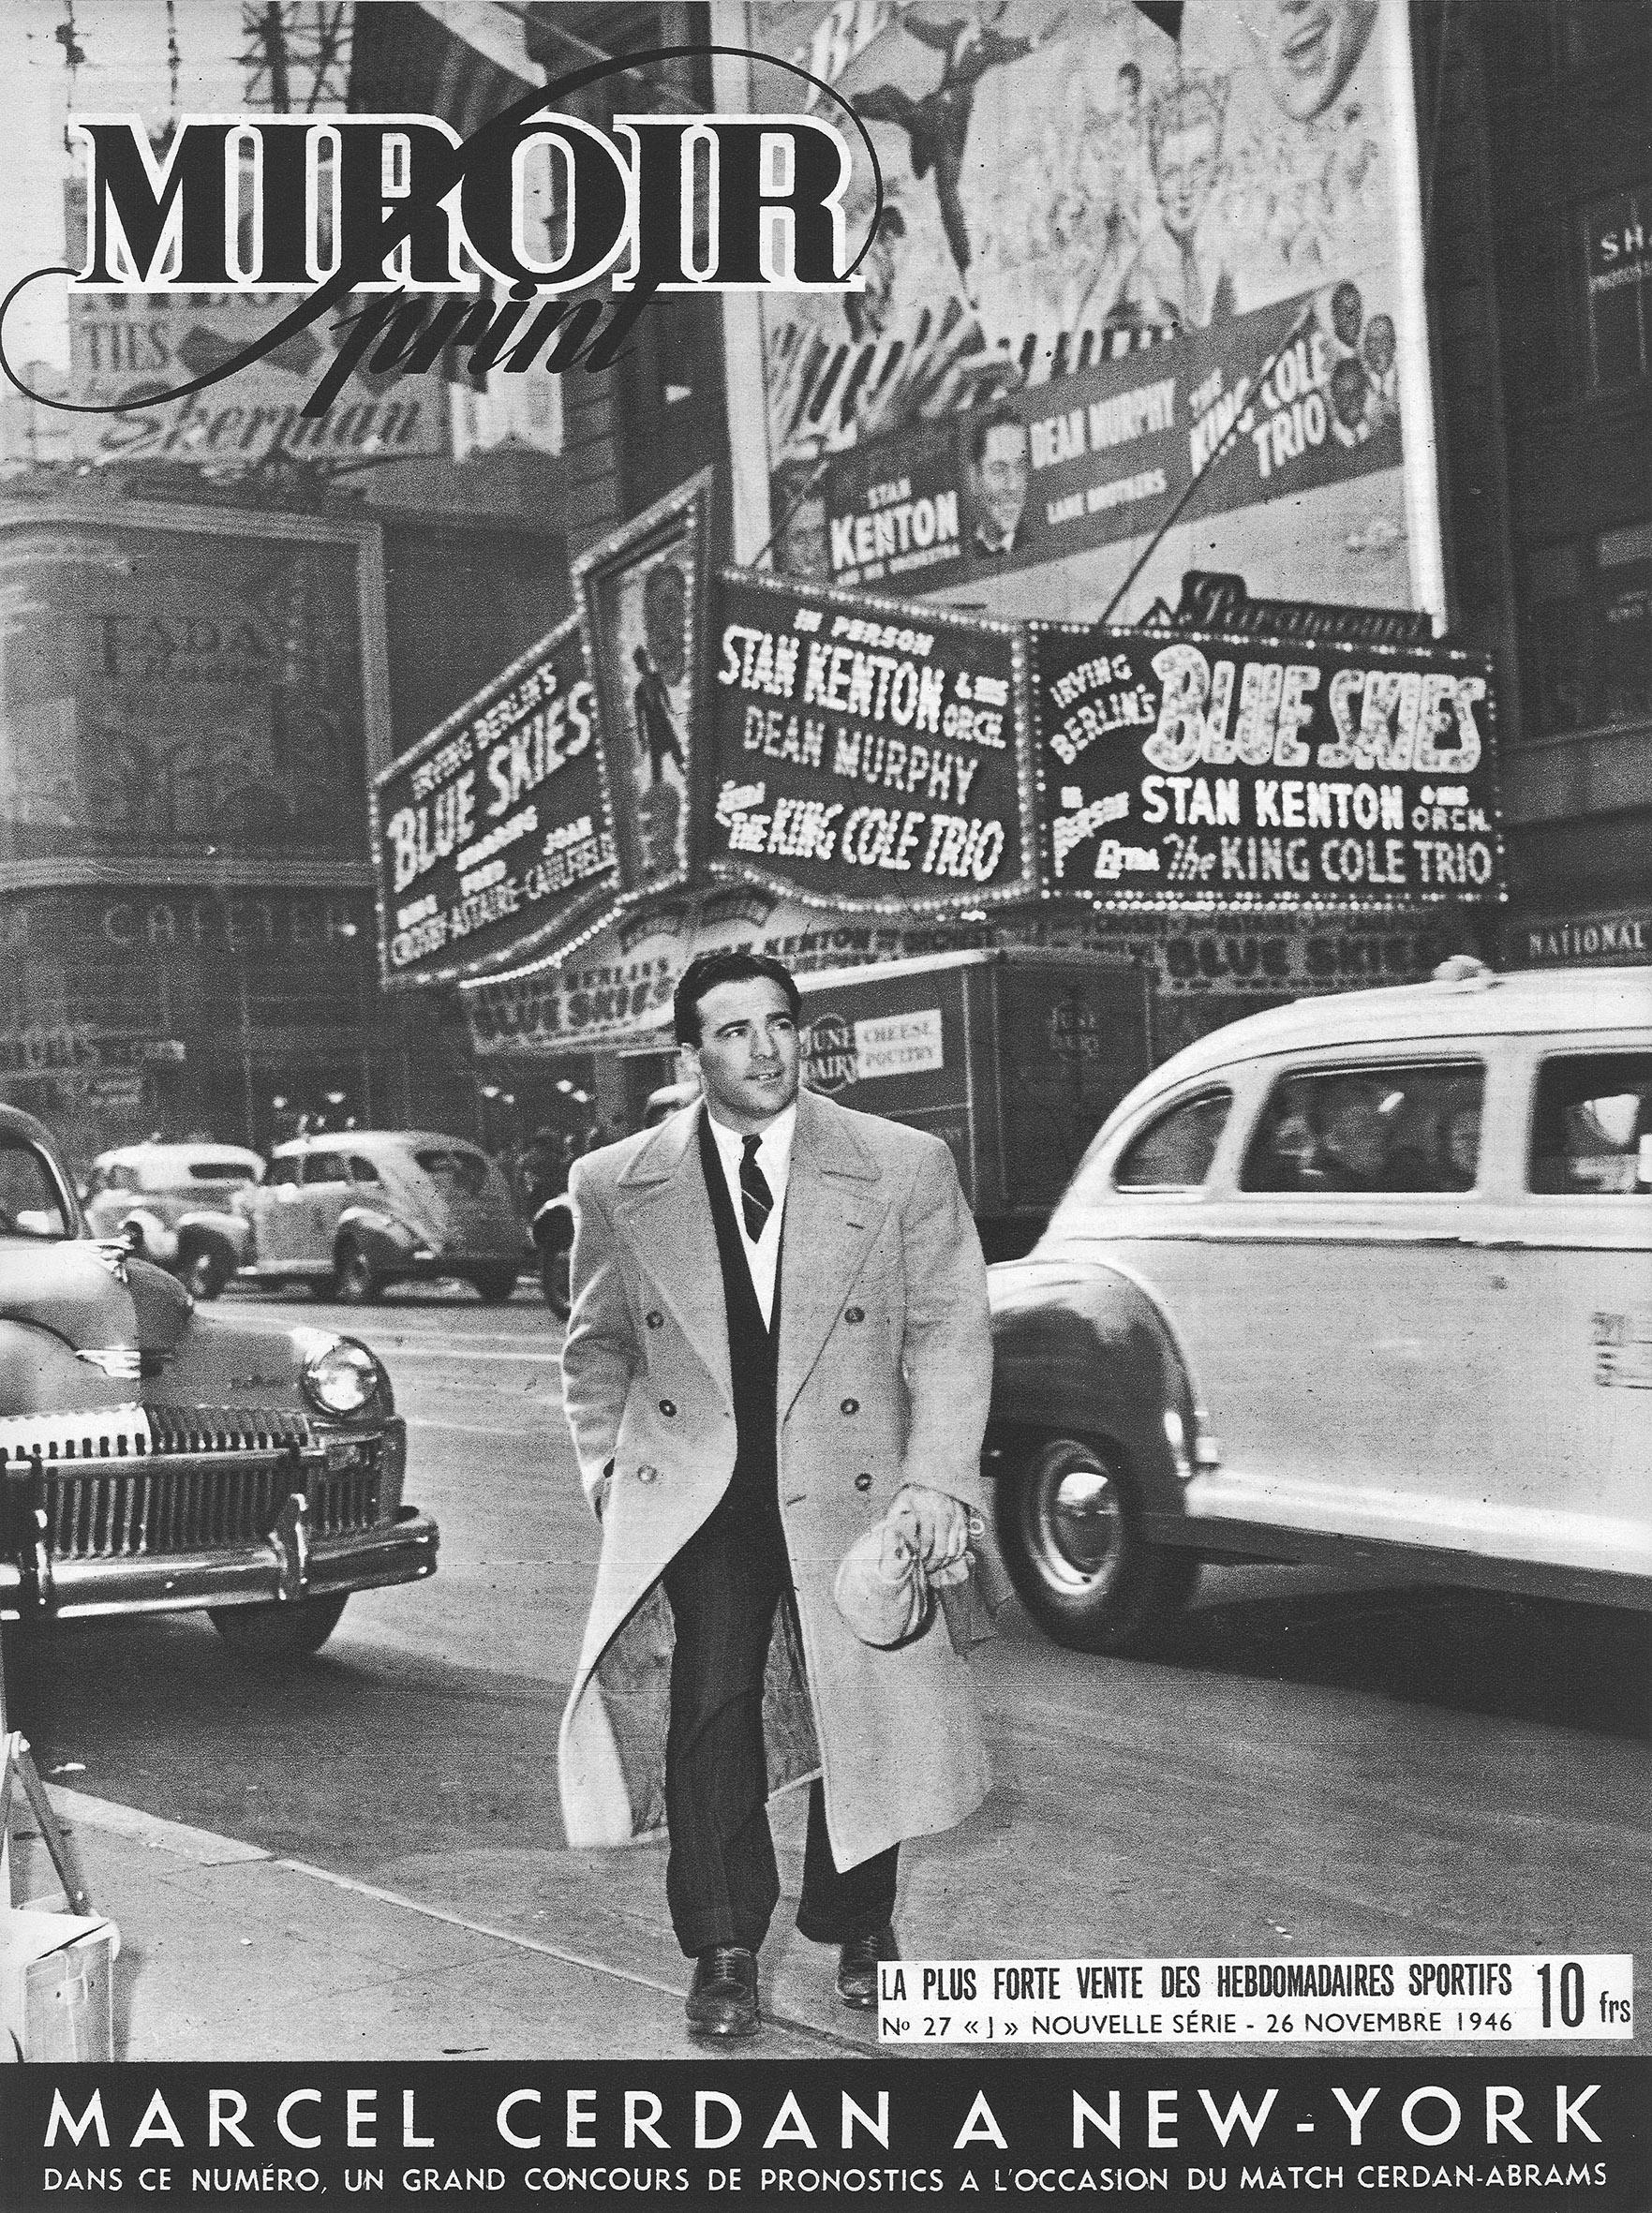 Marcel Cerdan Miroir Sprint n_27_novembre 1946.jpg